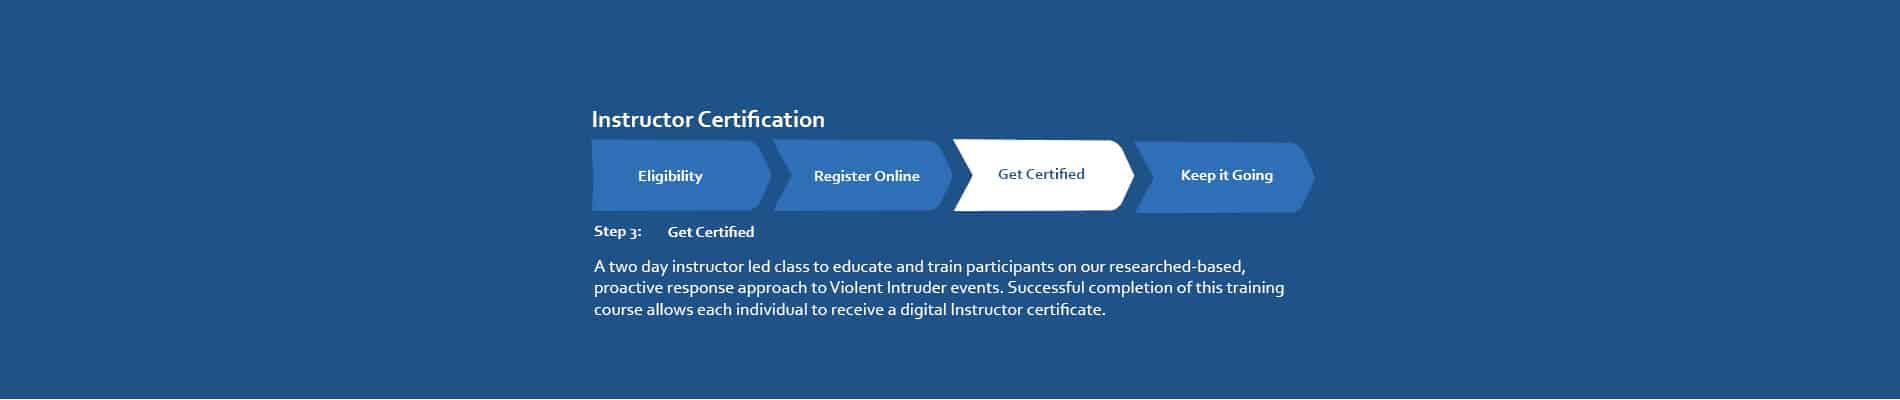 (v4.13.16) Training Options Sliders-(step3) Instructor